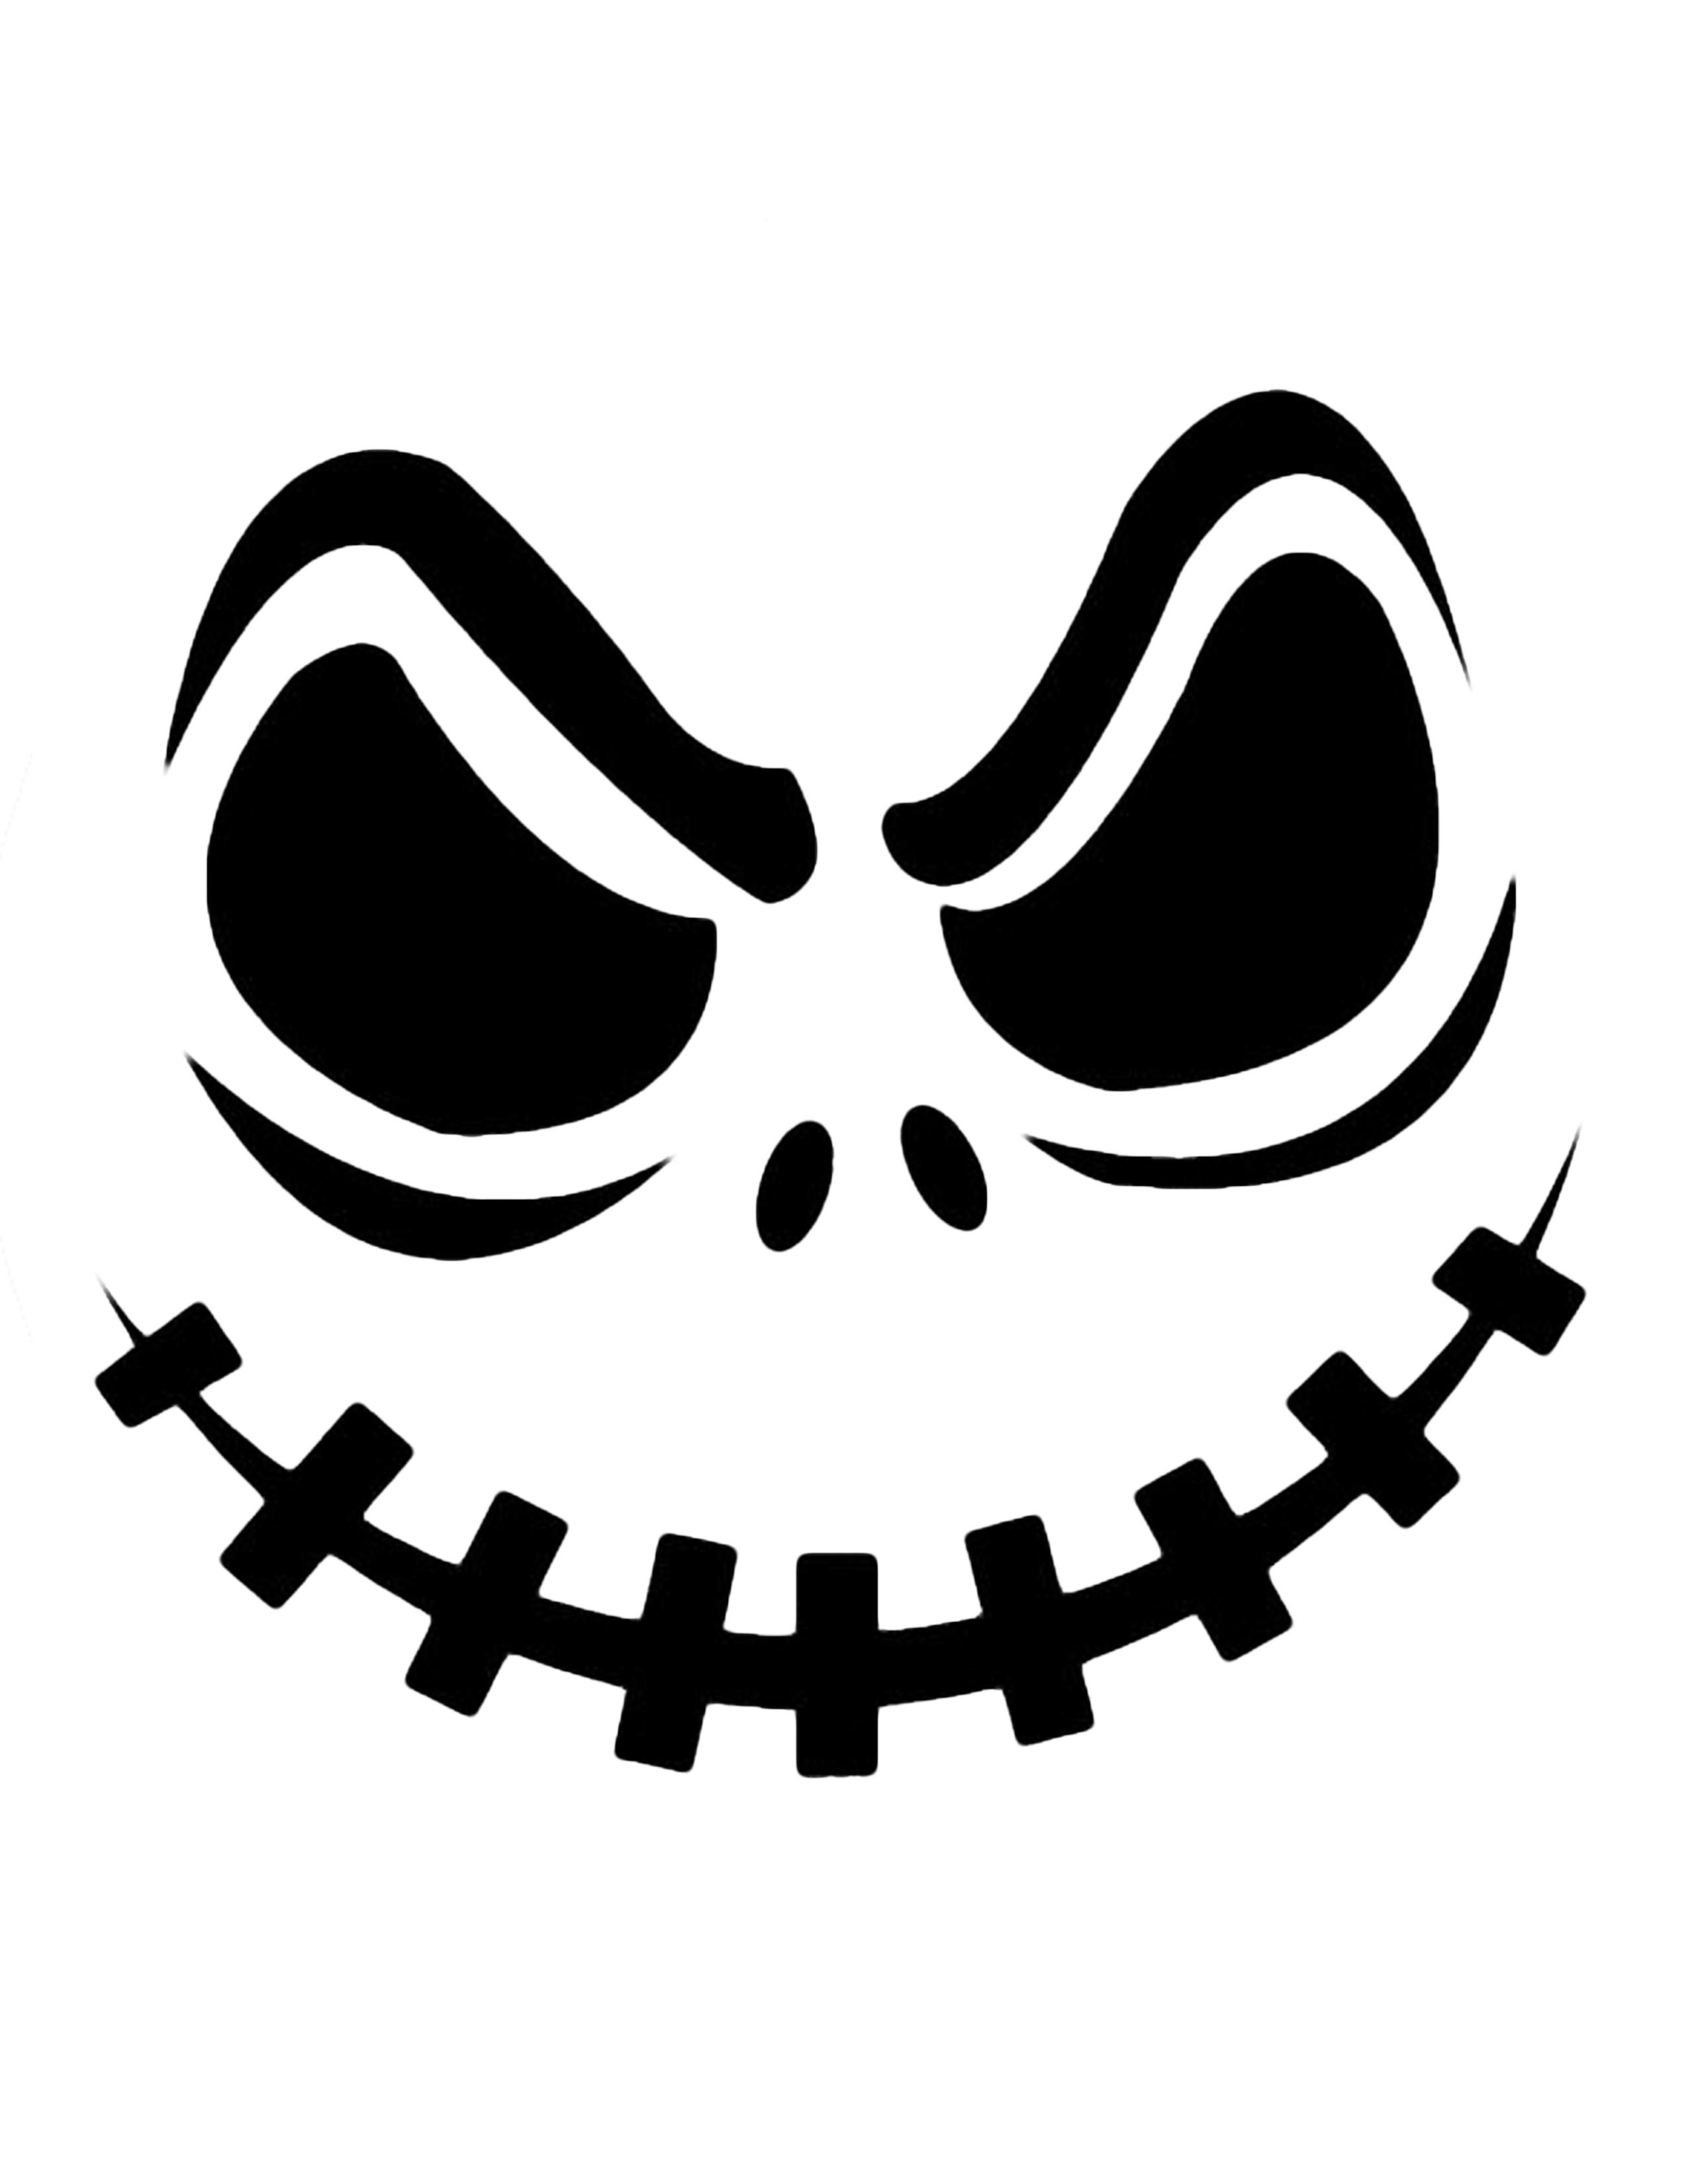 2550x3300 Halloween Black And White Interesting Halloween Pumpkin Carving